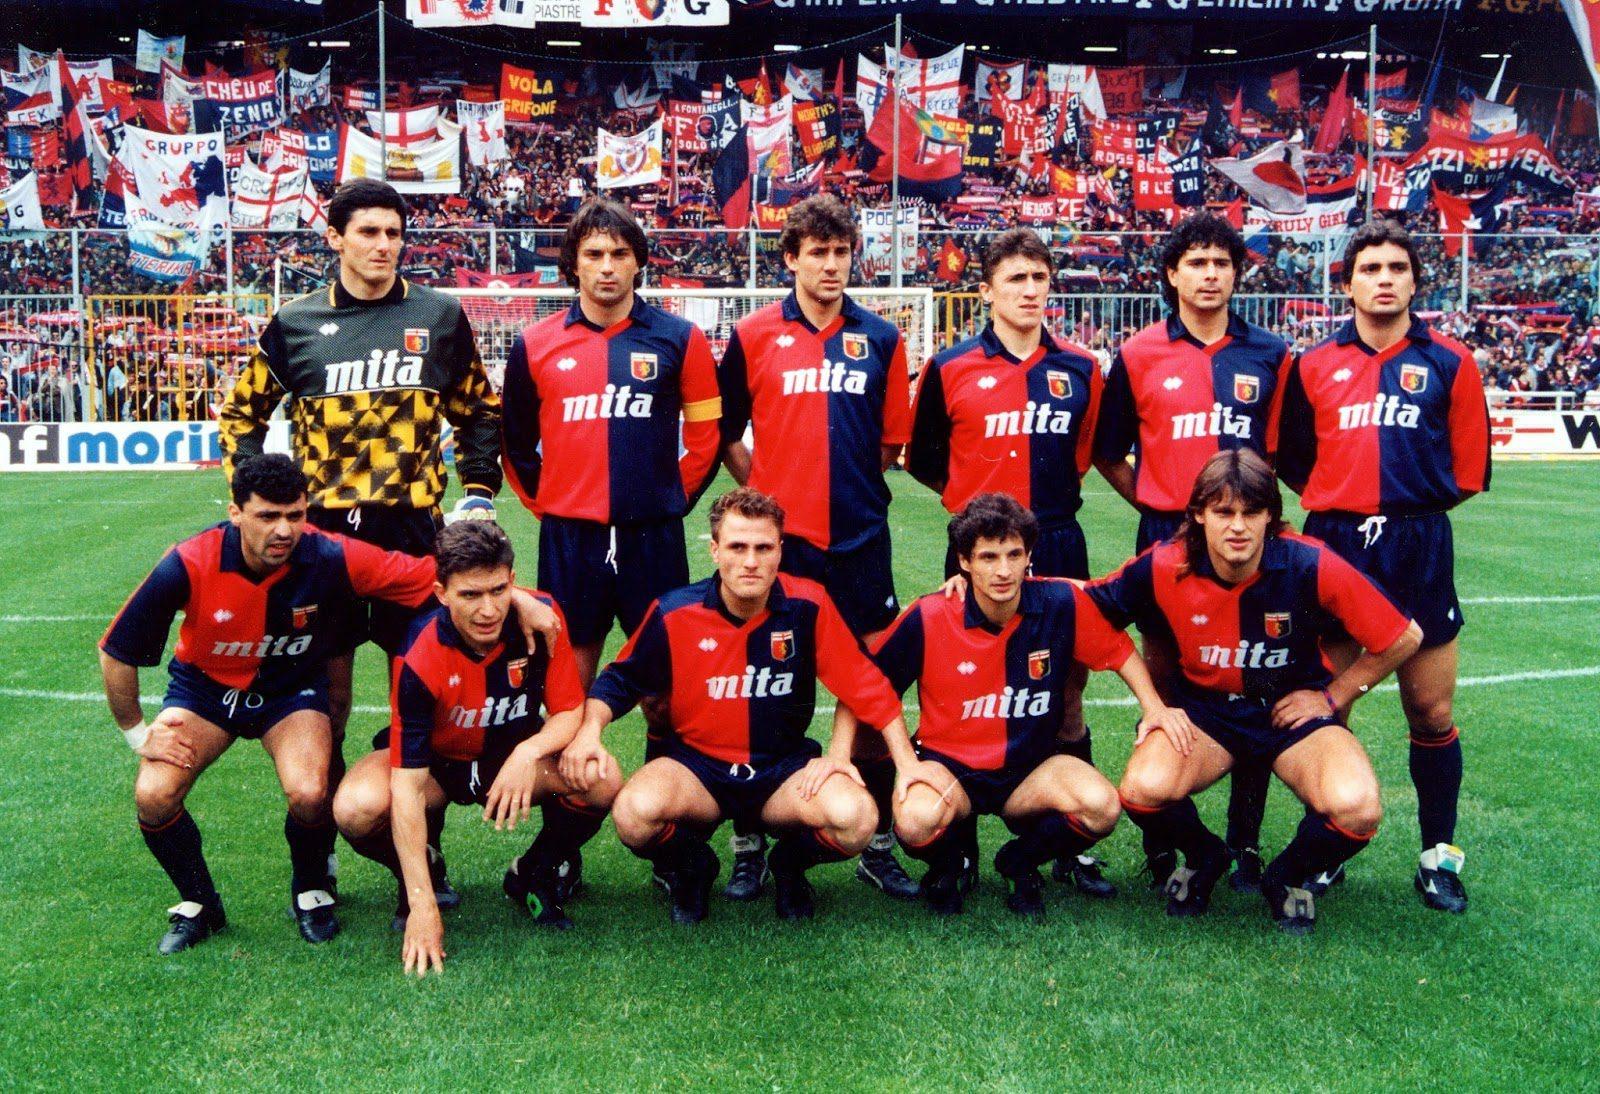 Os 10 Maiores Jogadores Da Hist 243 Ria Do Genoa Calciop 233 Dia